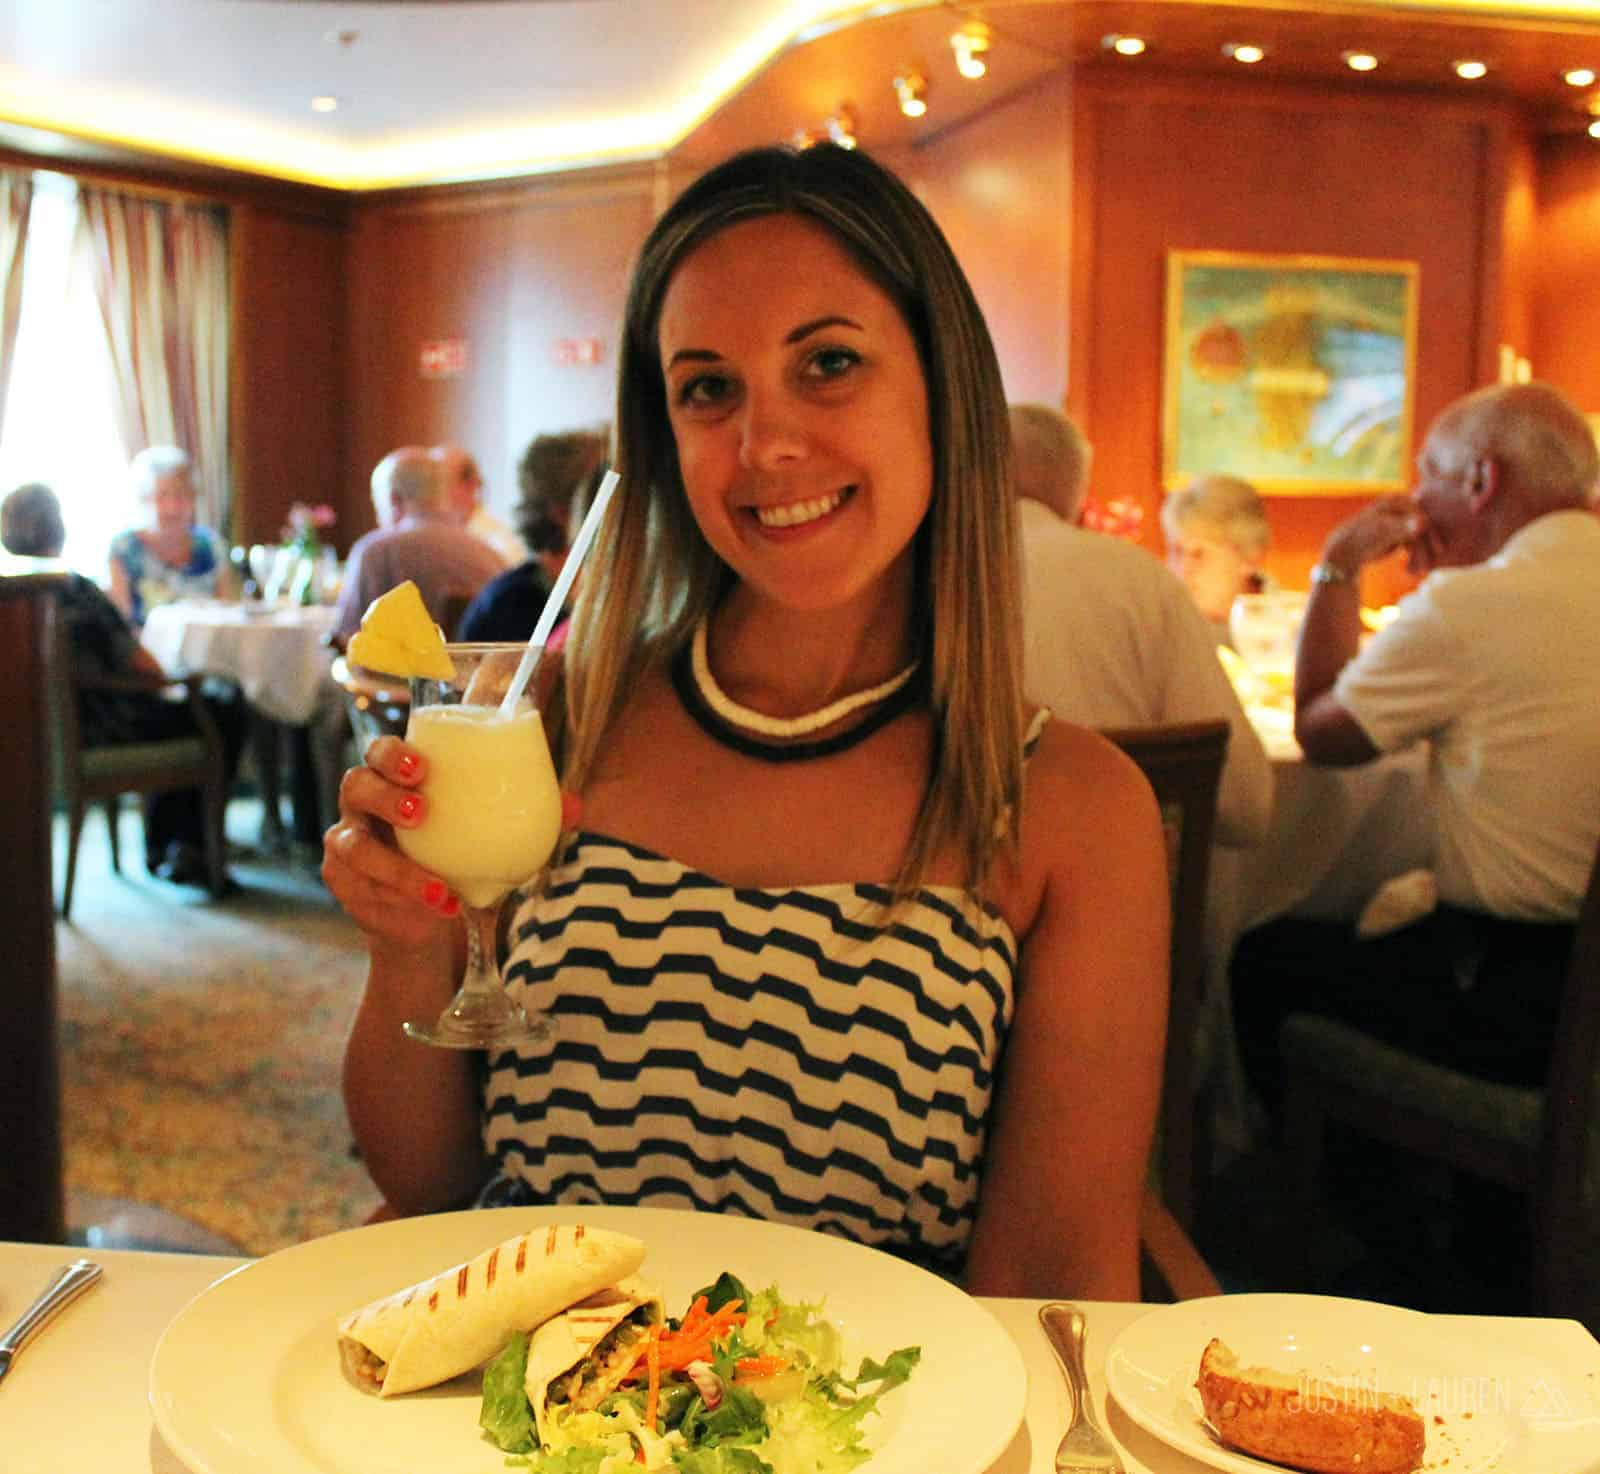 Caribbean Princess Cruise Ship - Pina Colada Soup